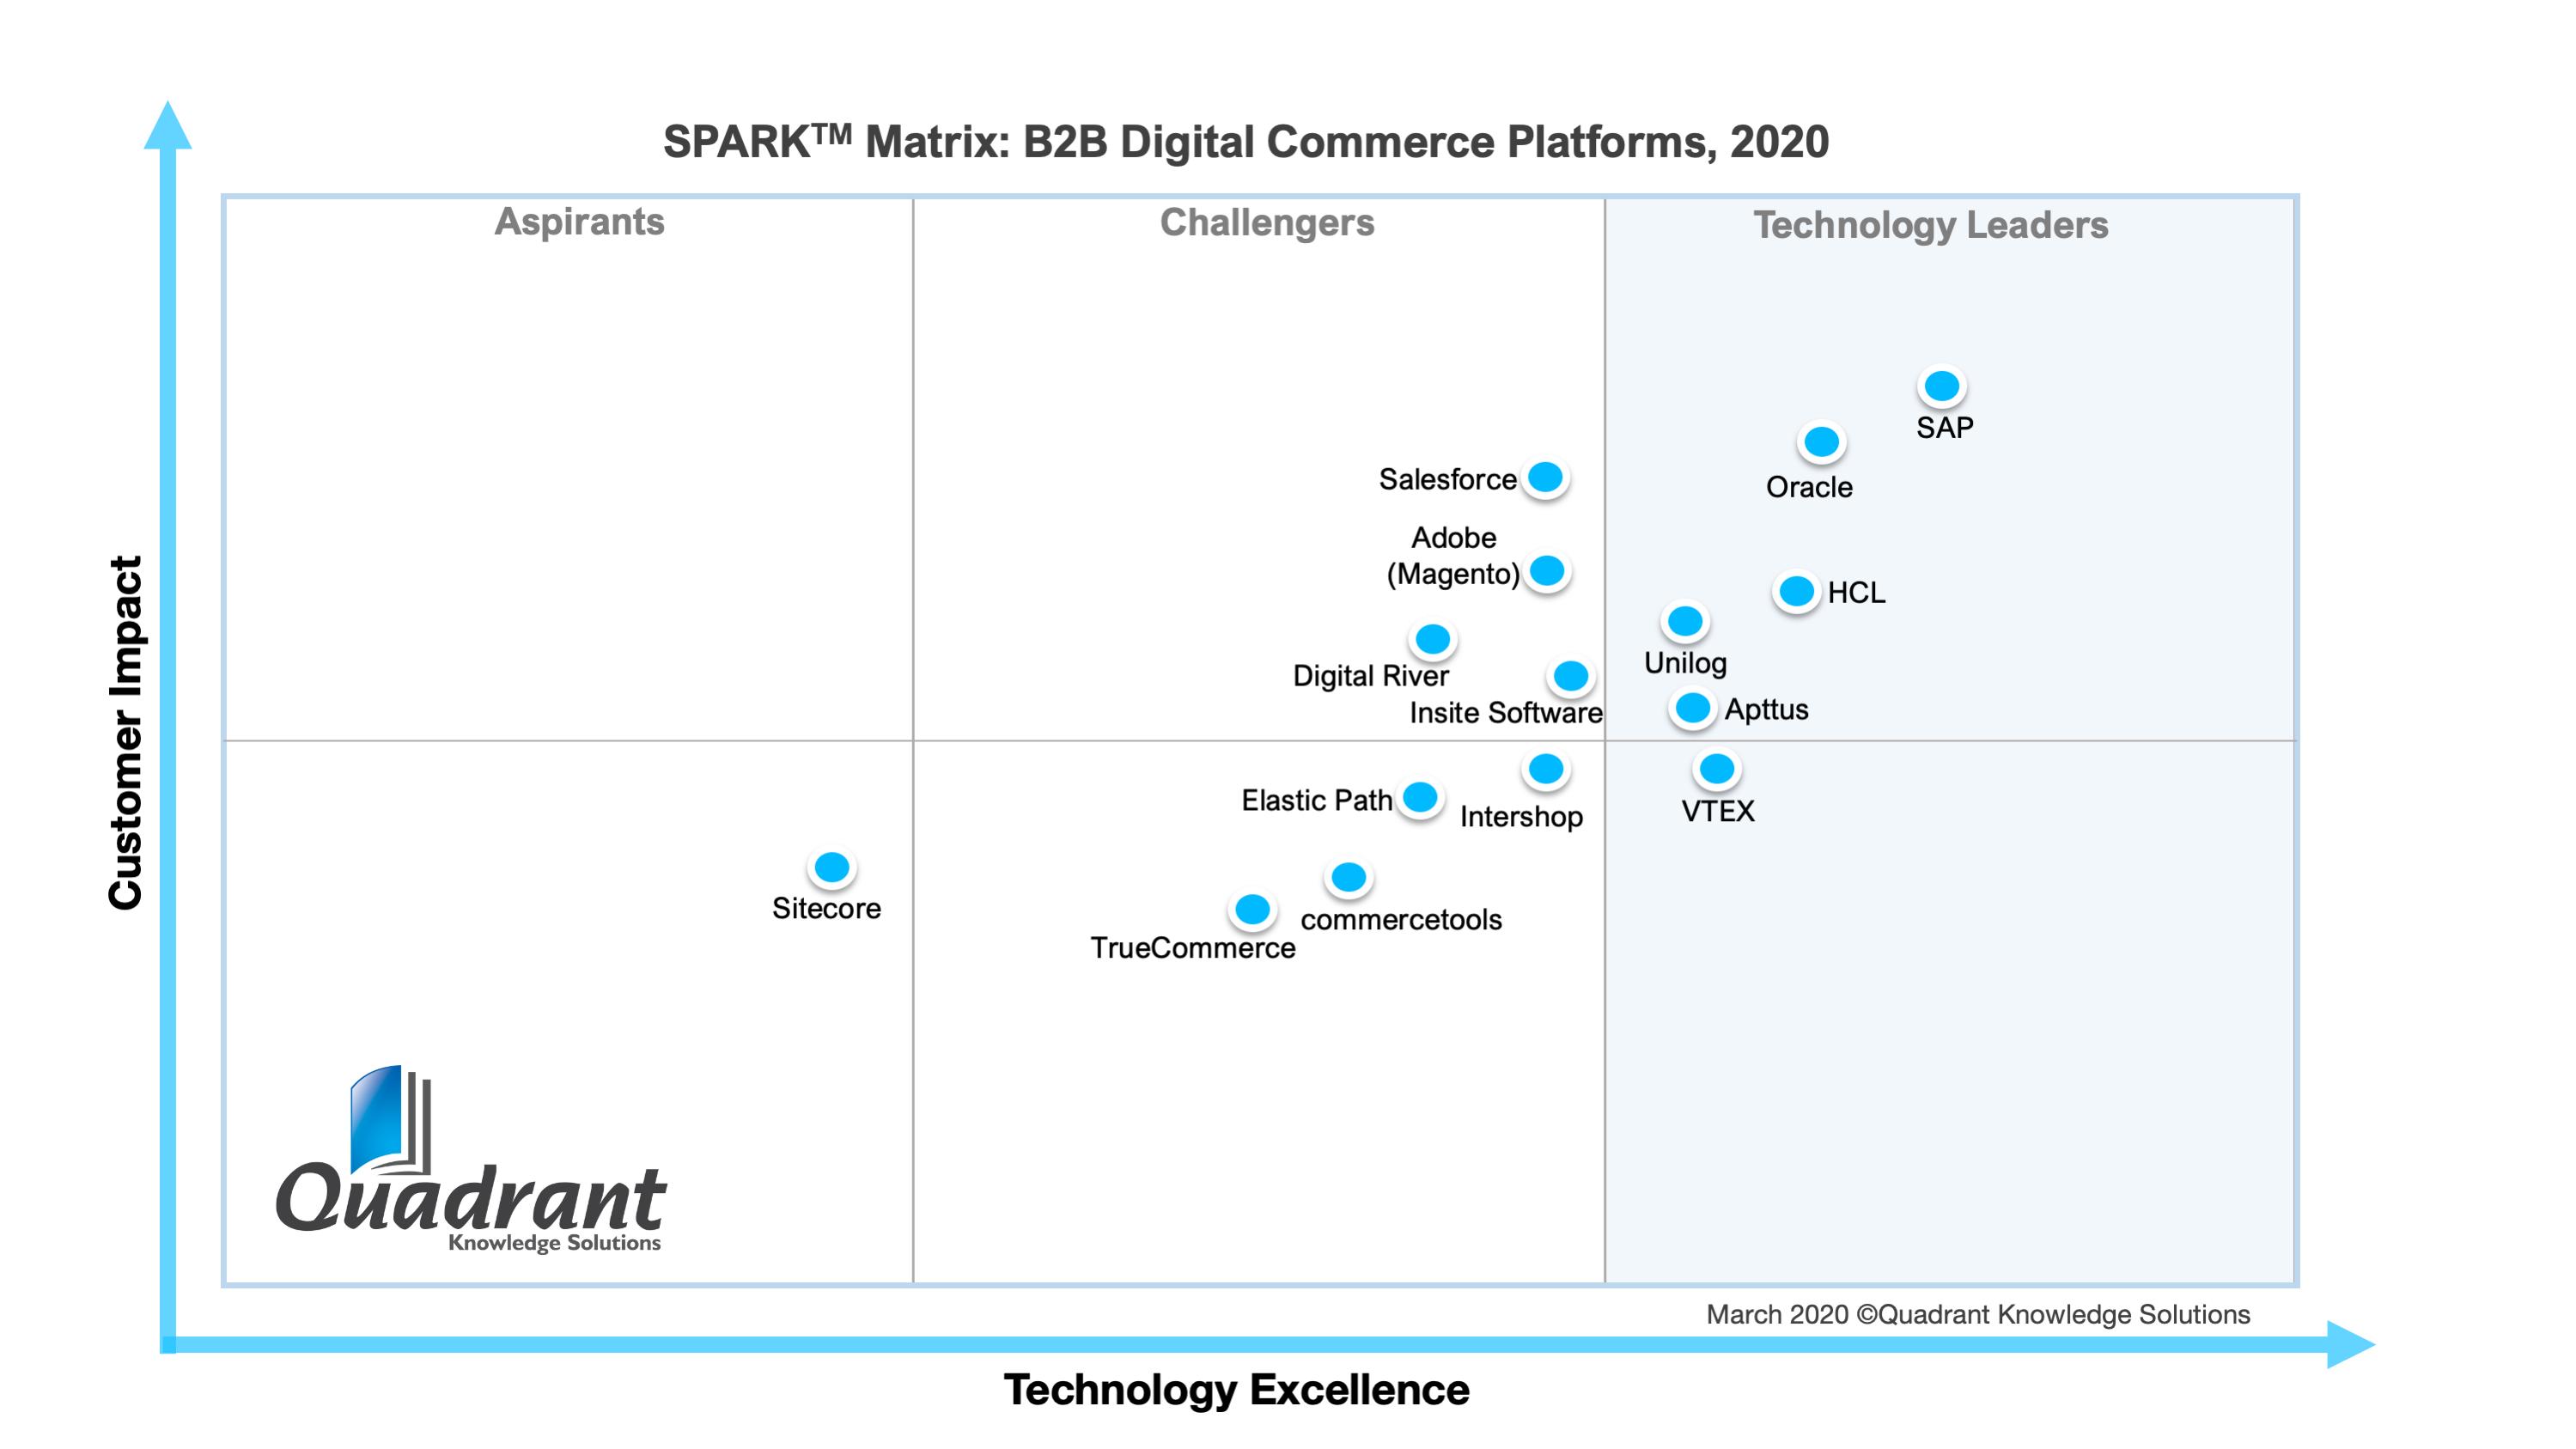 2020 SPARK Matrix of B2B Digital Commerce Platforms by Quadrant Knowledge Solutions